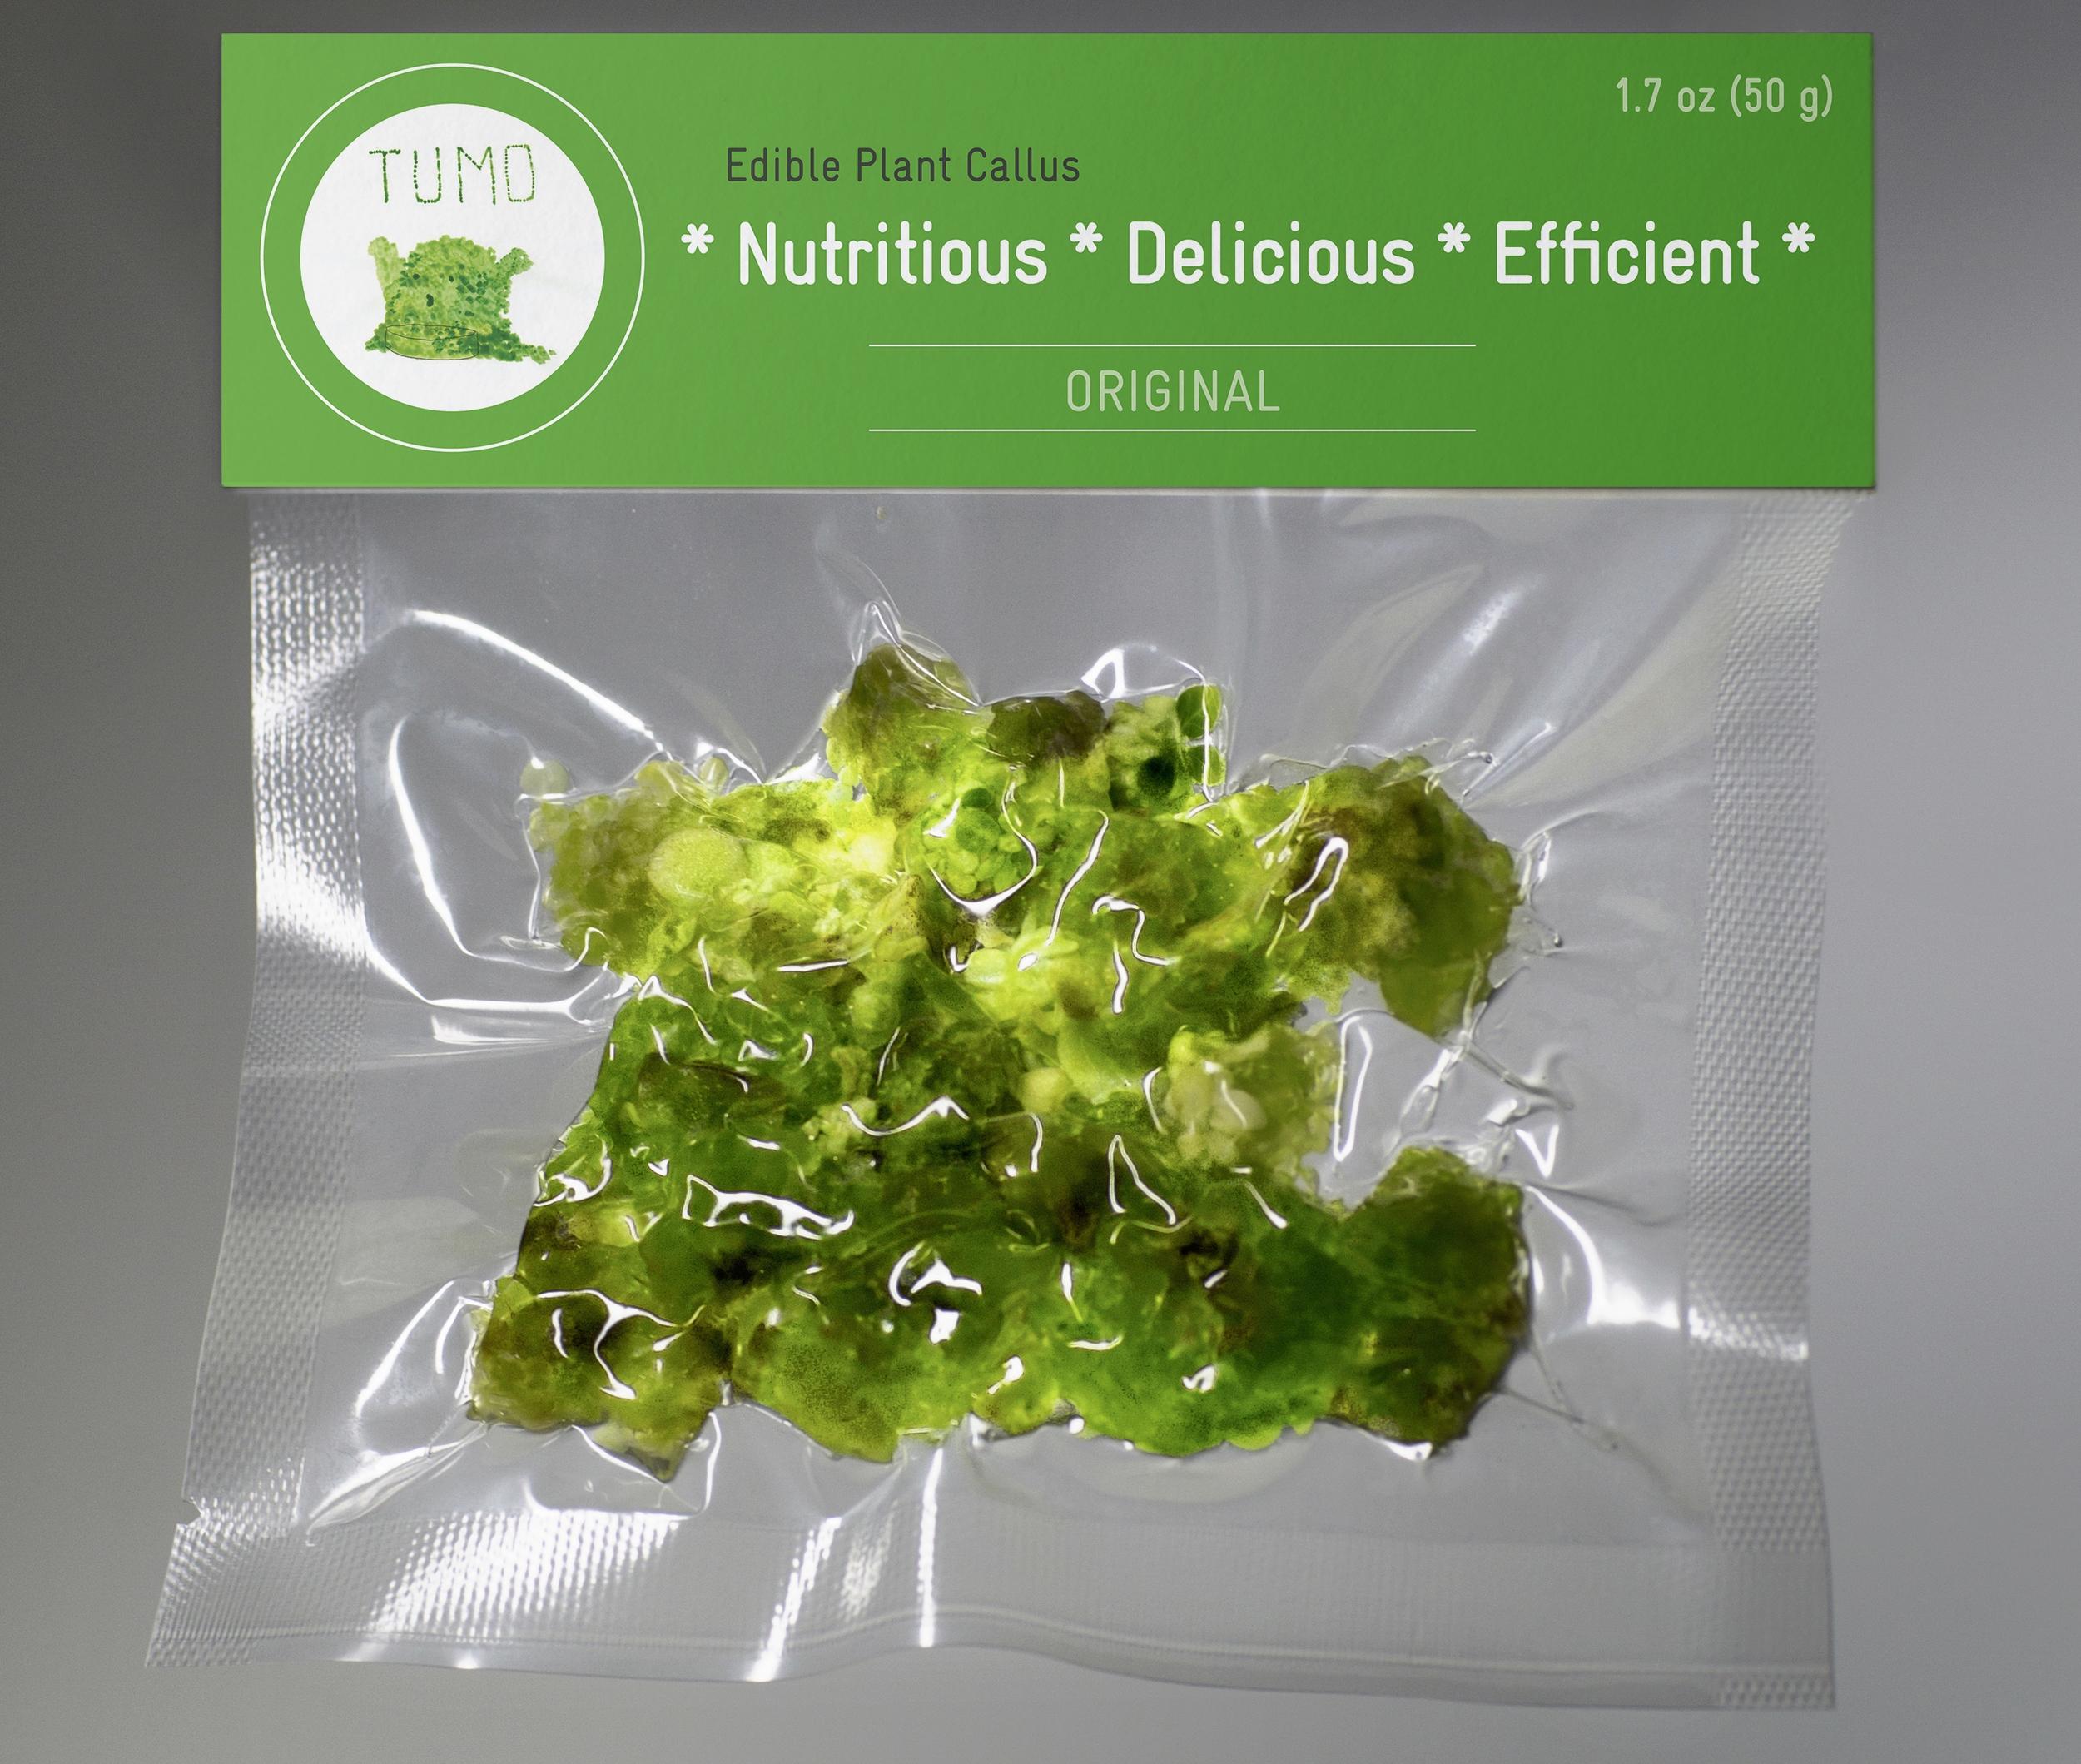 TUMO - Edible Plant Callus - 3.jpeg